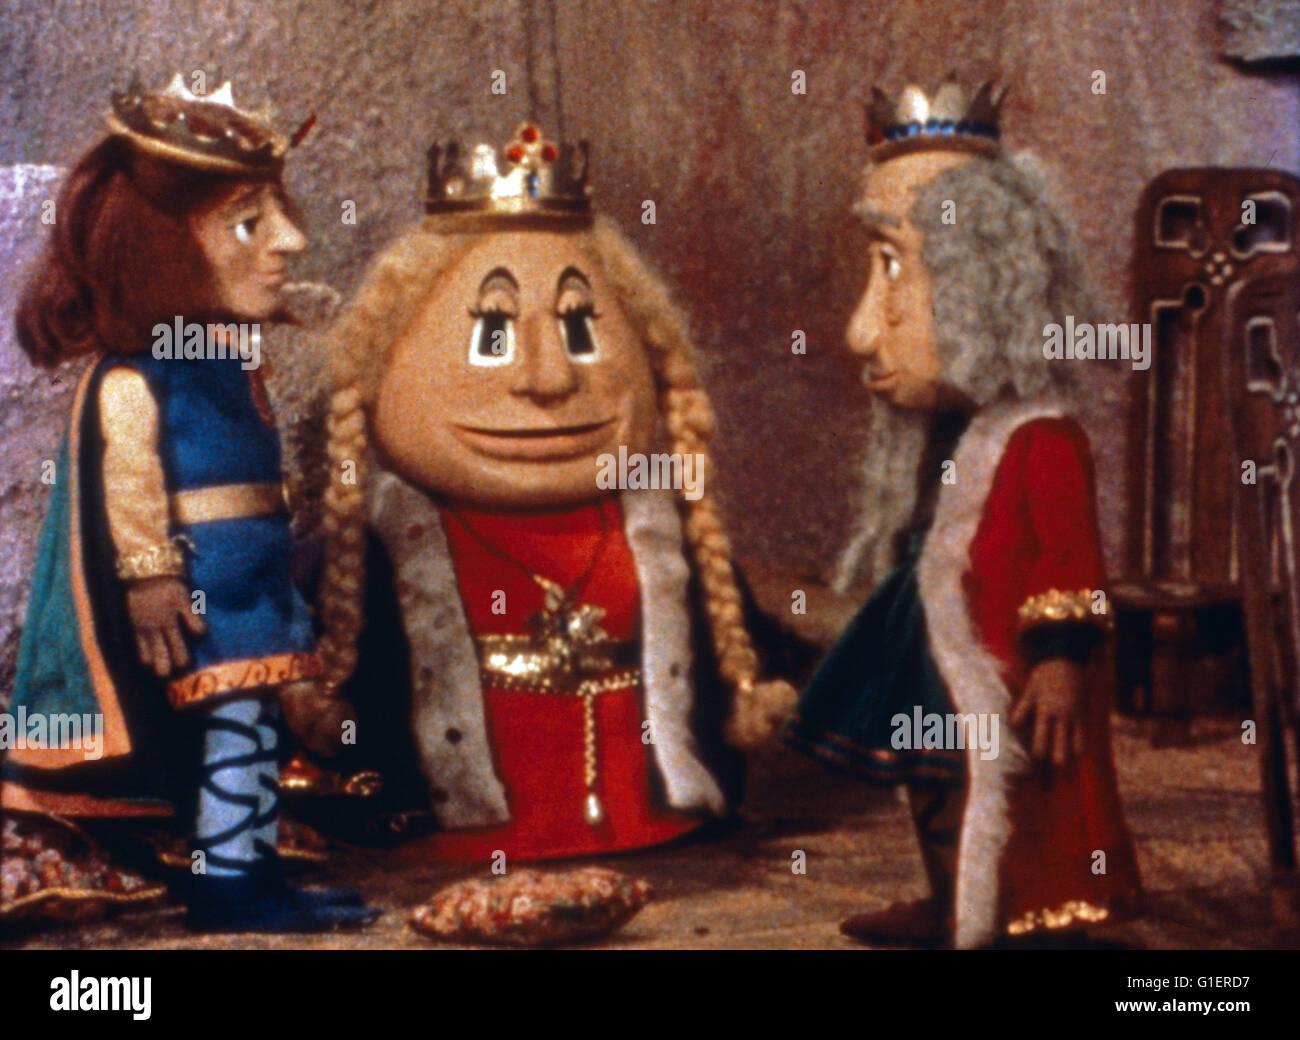 O Castelo de Cloppa, Großbritannien Puppentrickserie, 1977, Imagens de Stock